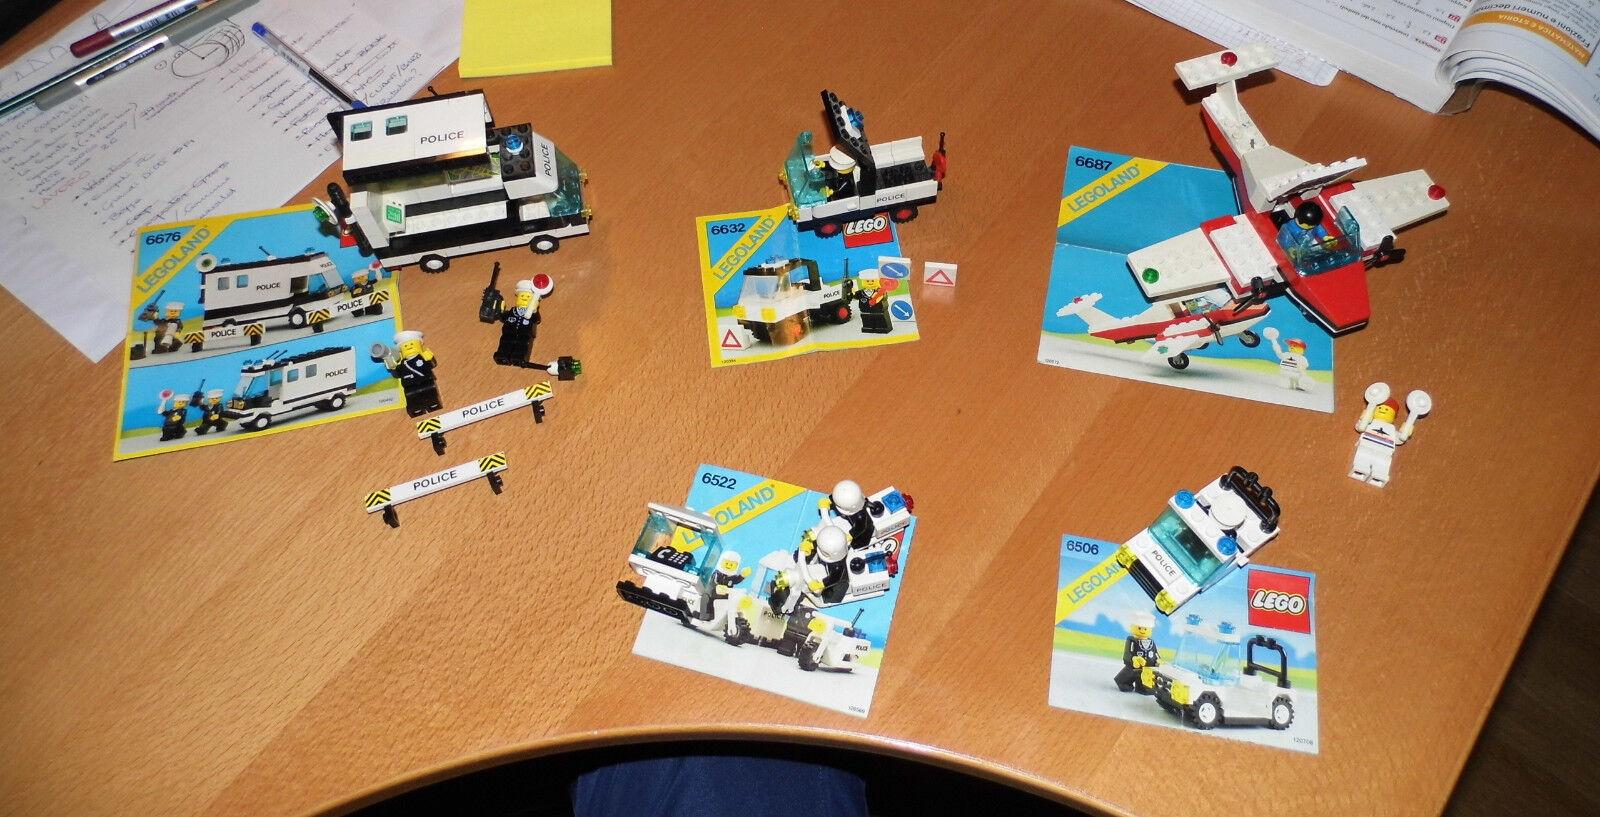 Lotto LEGO art. 6676 6632 6522 6687 6506  leggi   Vintage  Anni90  Polizia